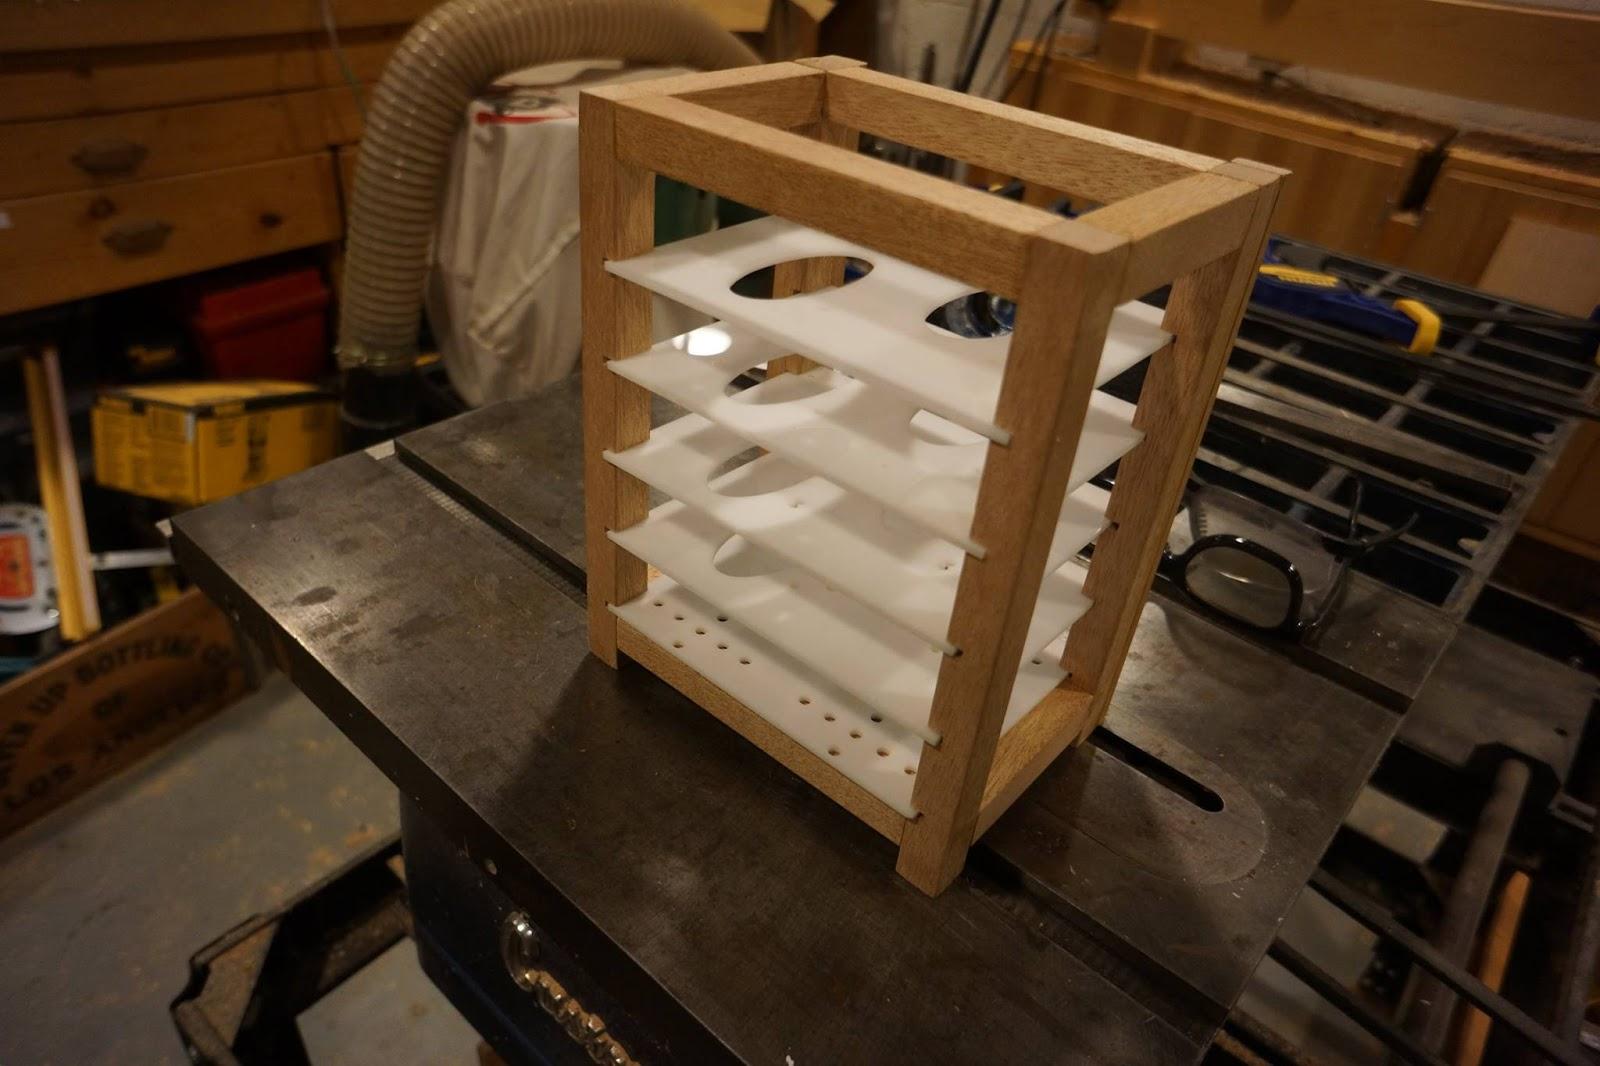 Sohliloquies: Making a Raspberry Pi Cluster's Rack